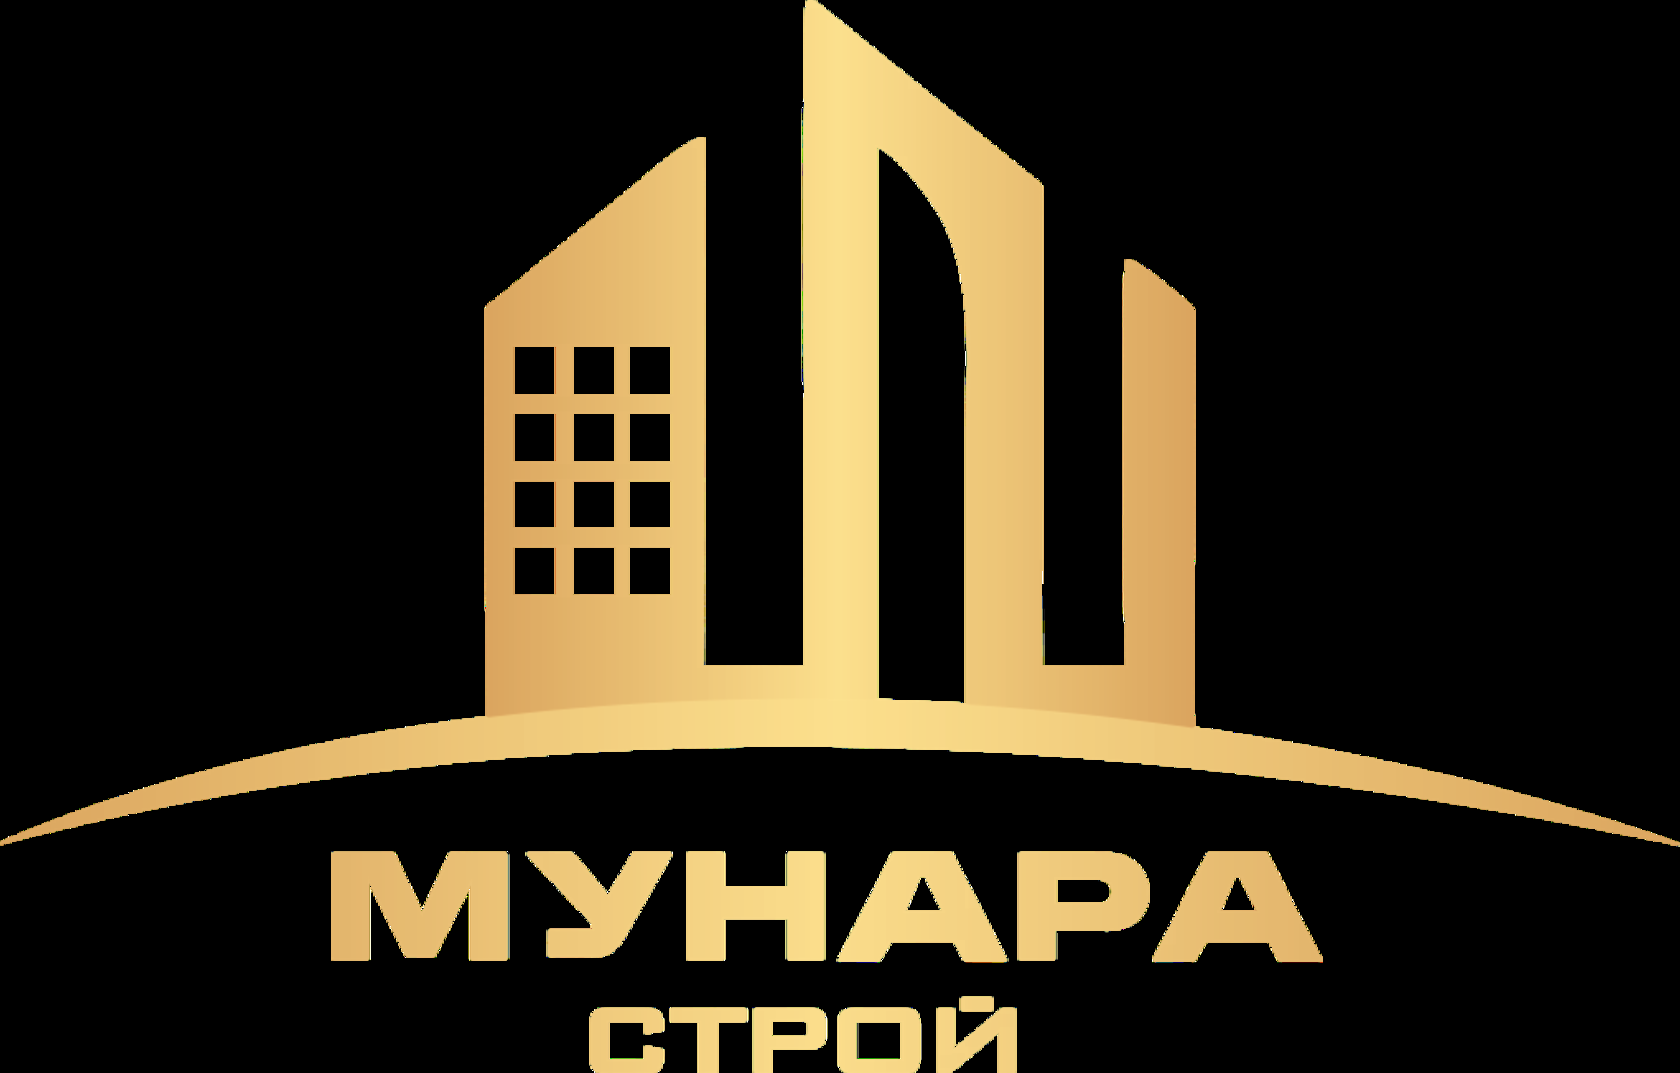 Мунара Строй